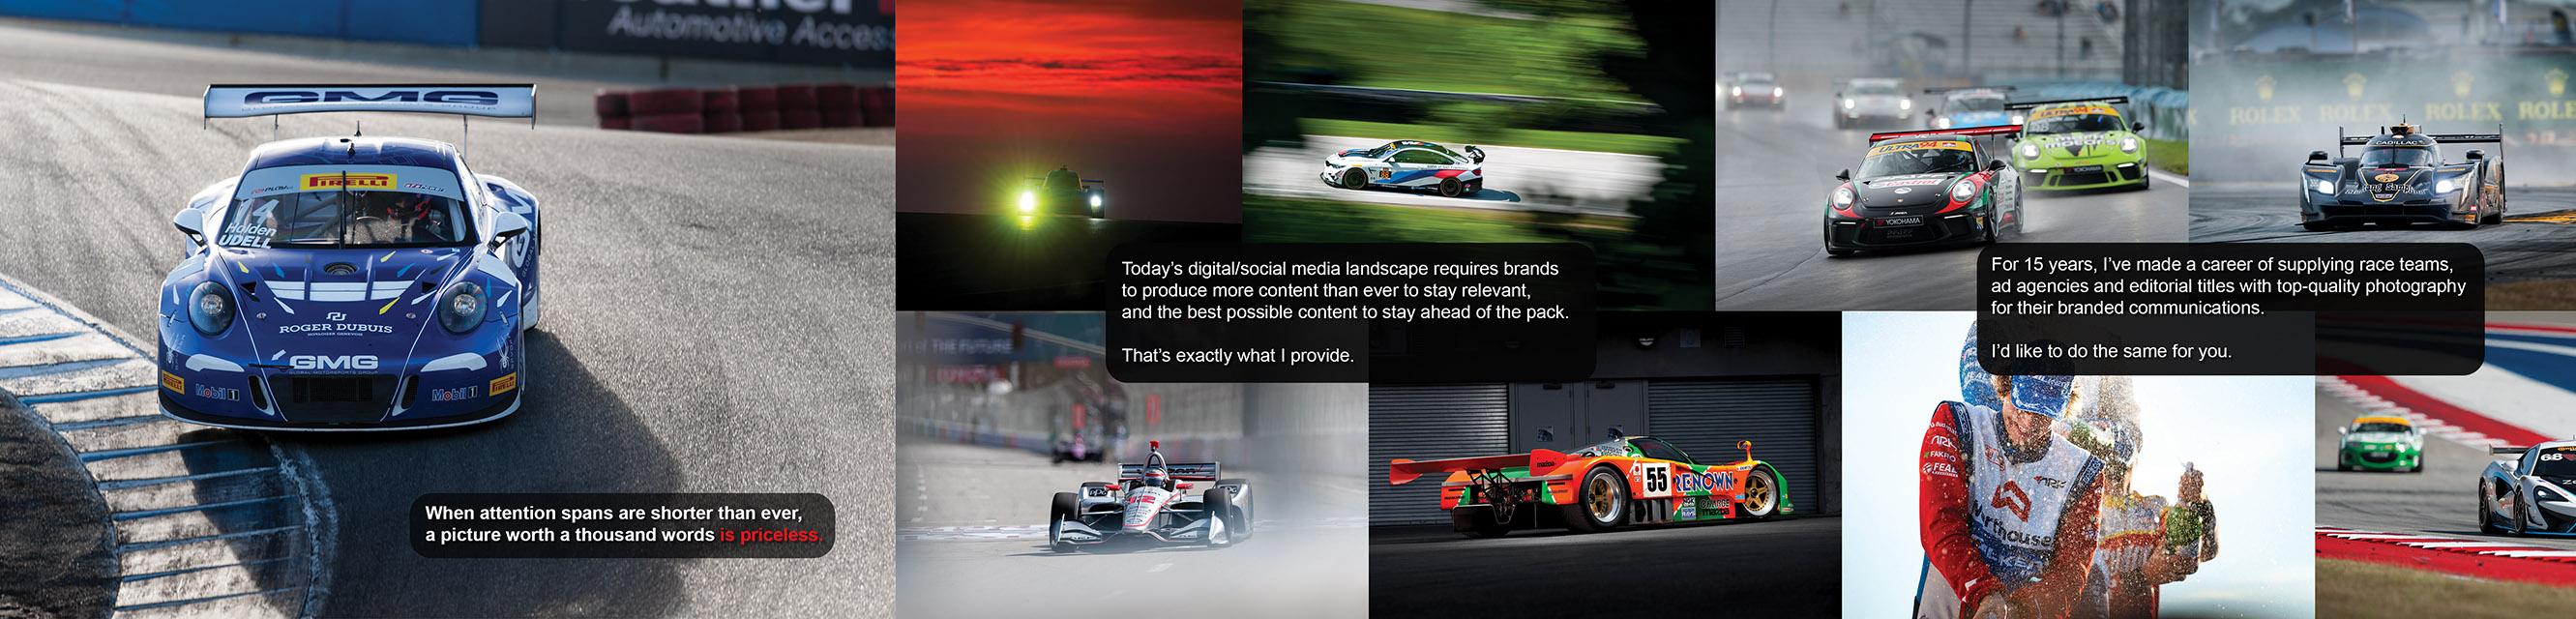 Thumbnail image 2020 Motorsports Photography brochure, digital version